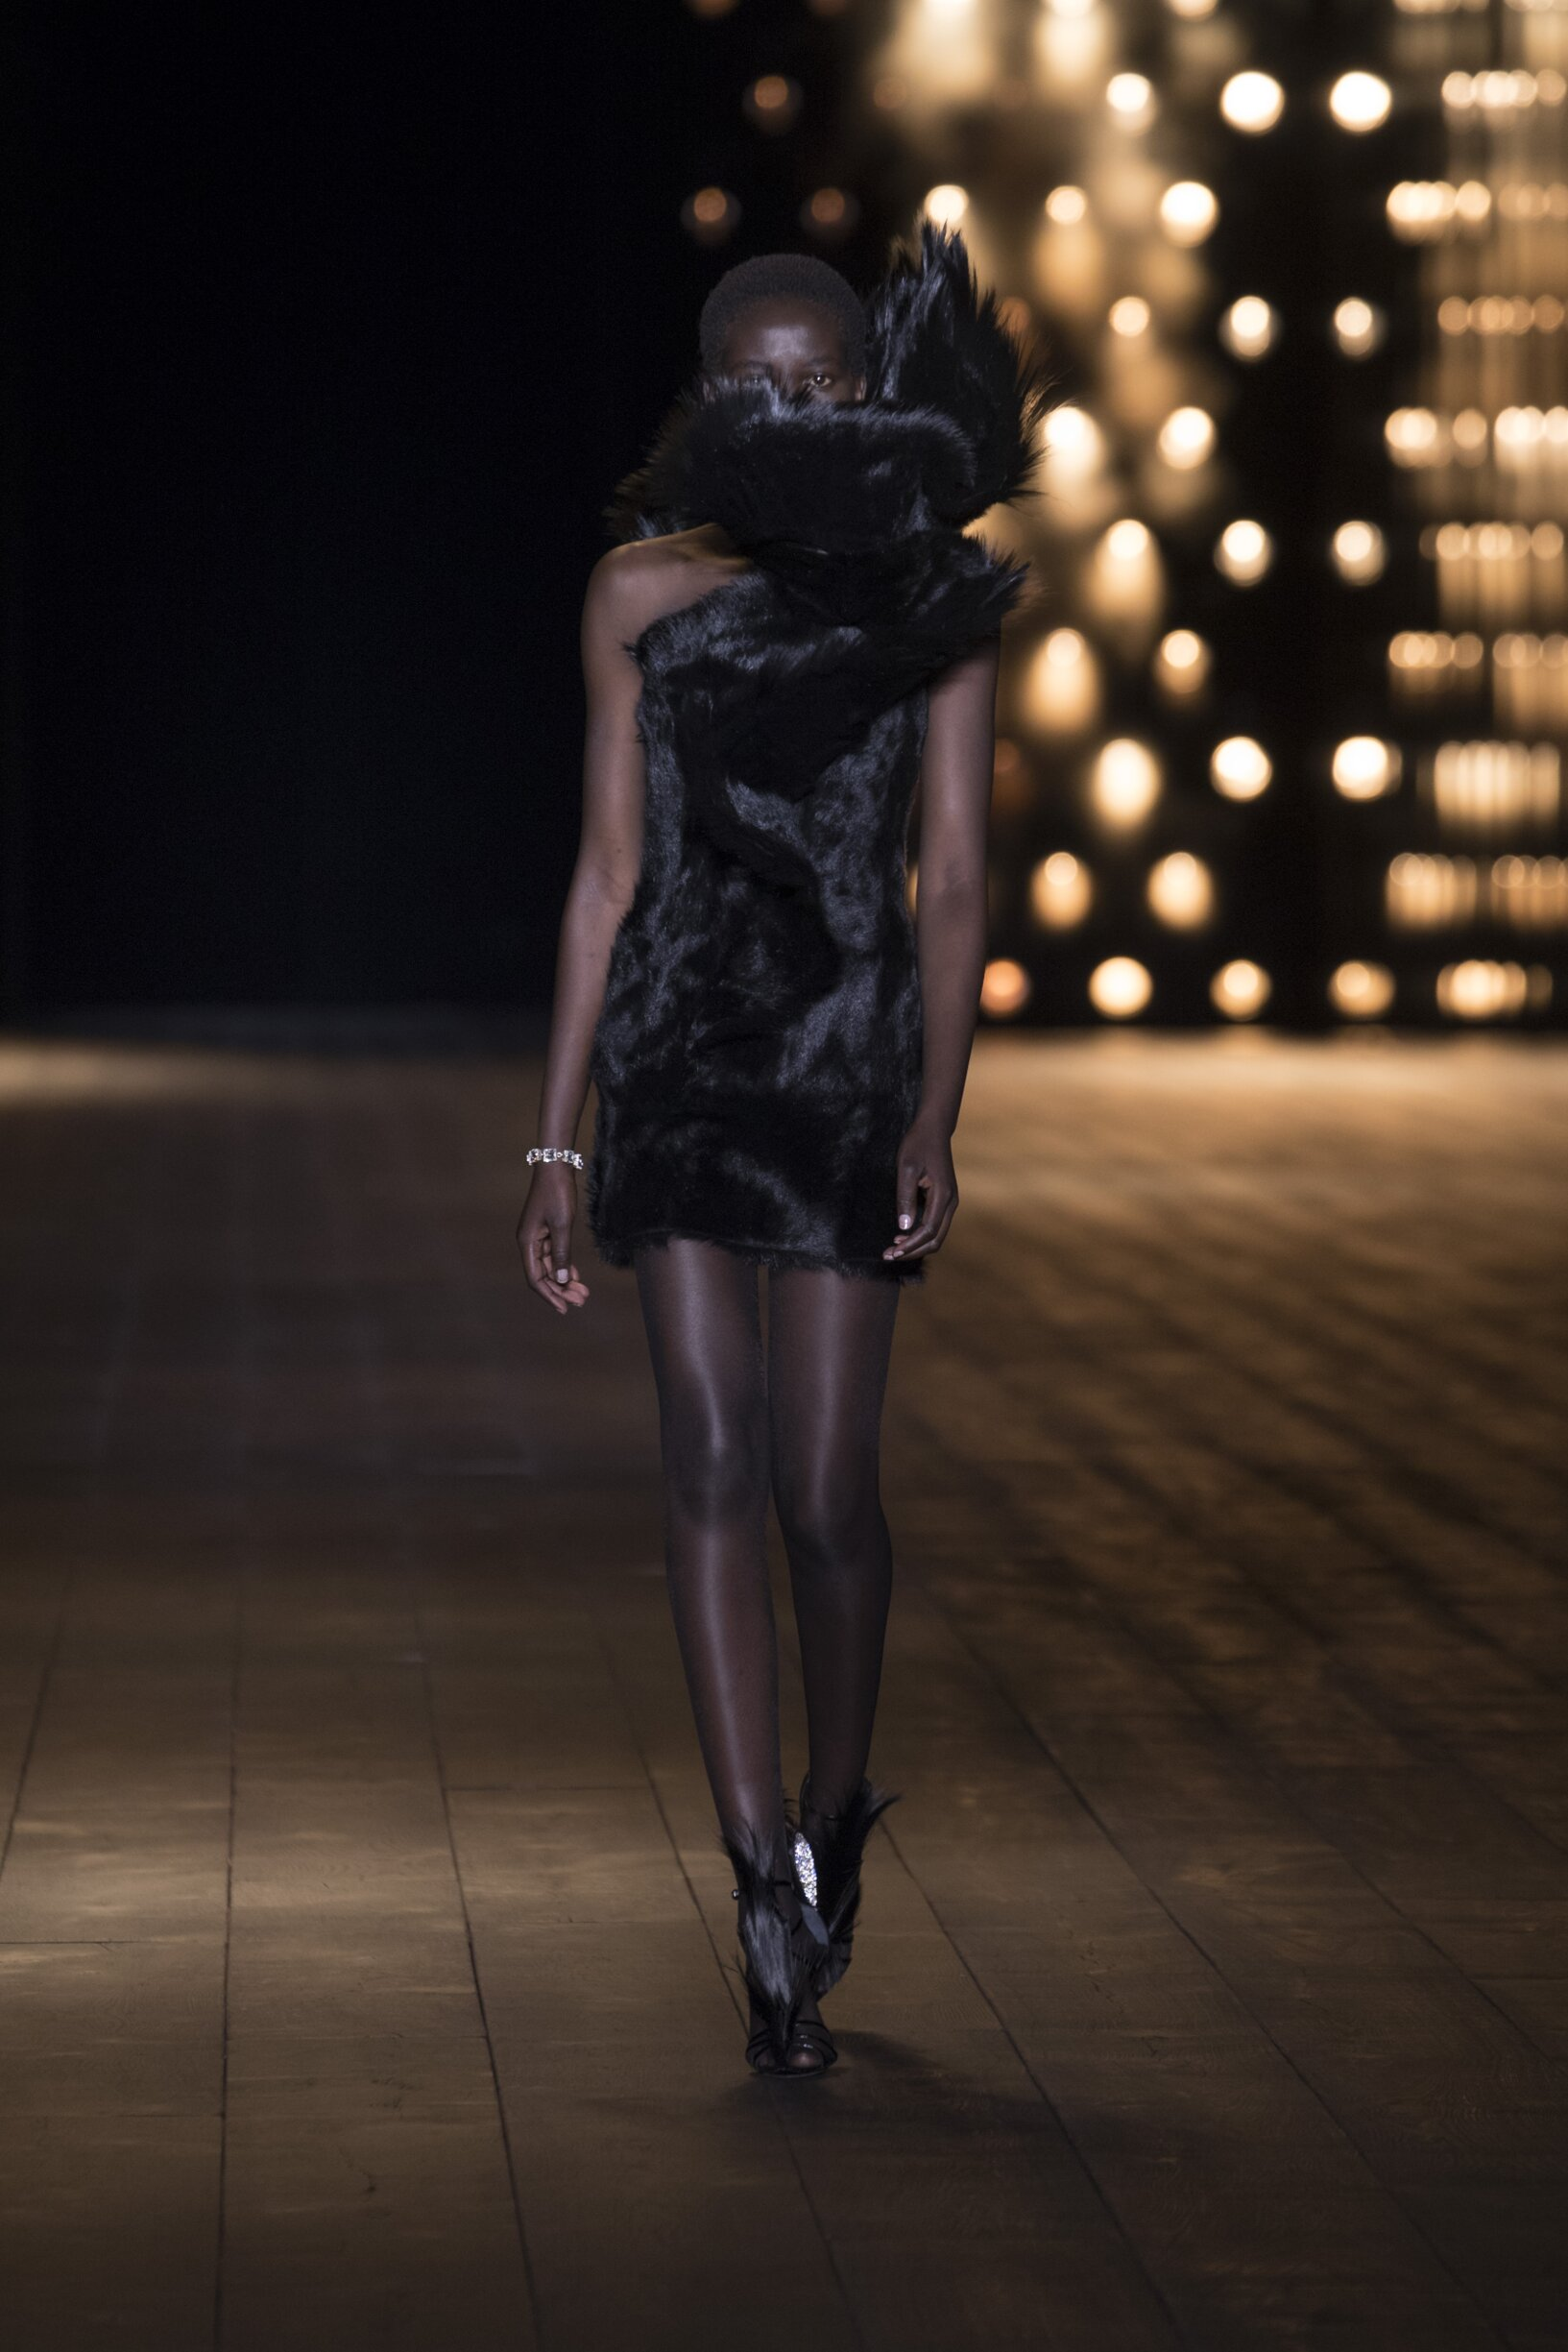 Saint Laurent Womenswear Collection Trends